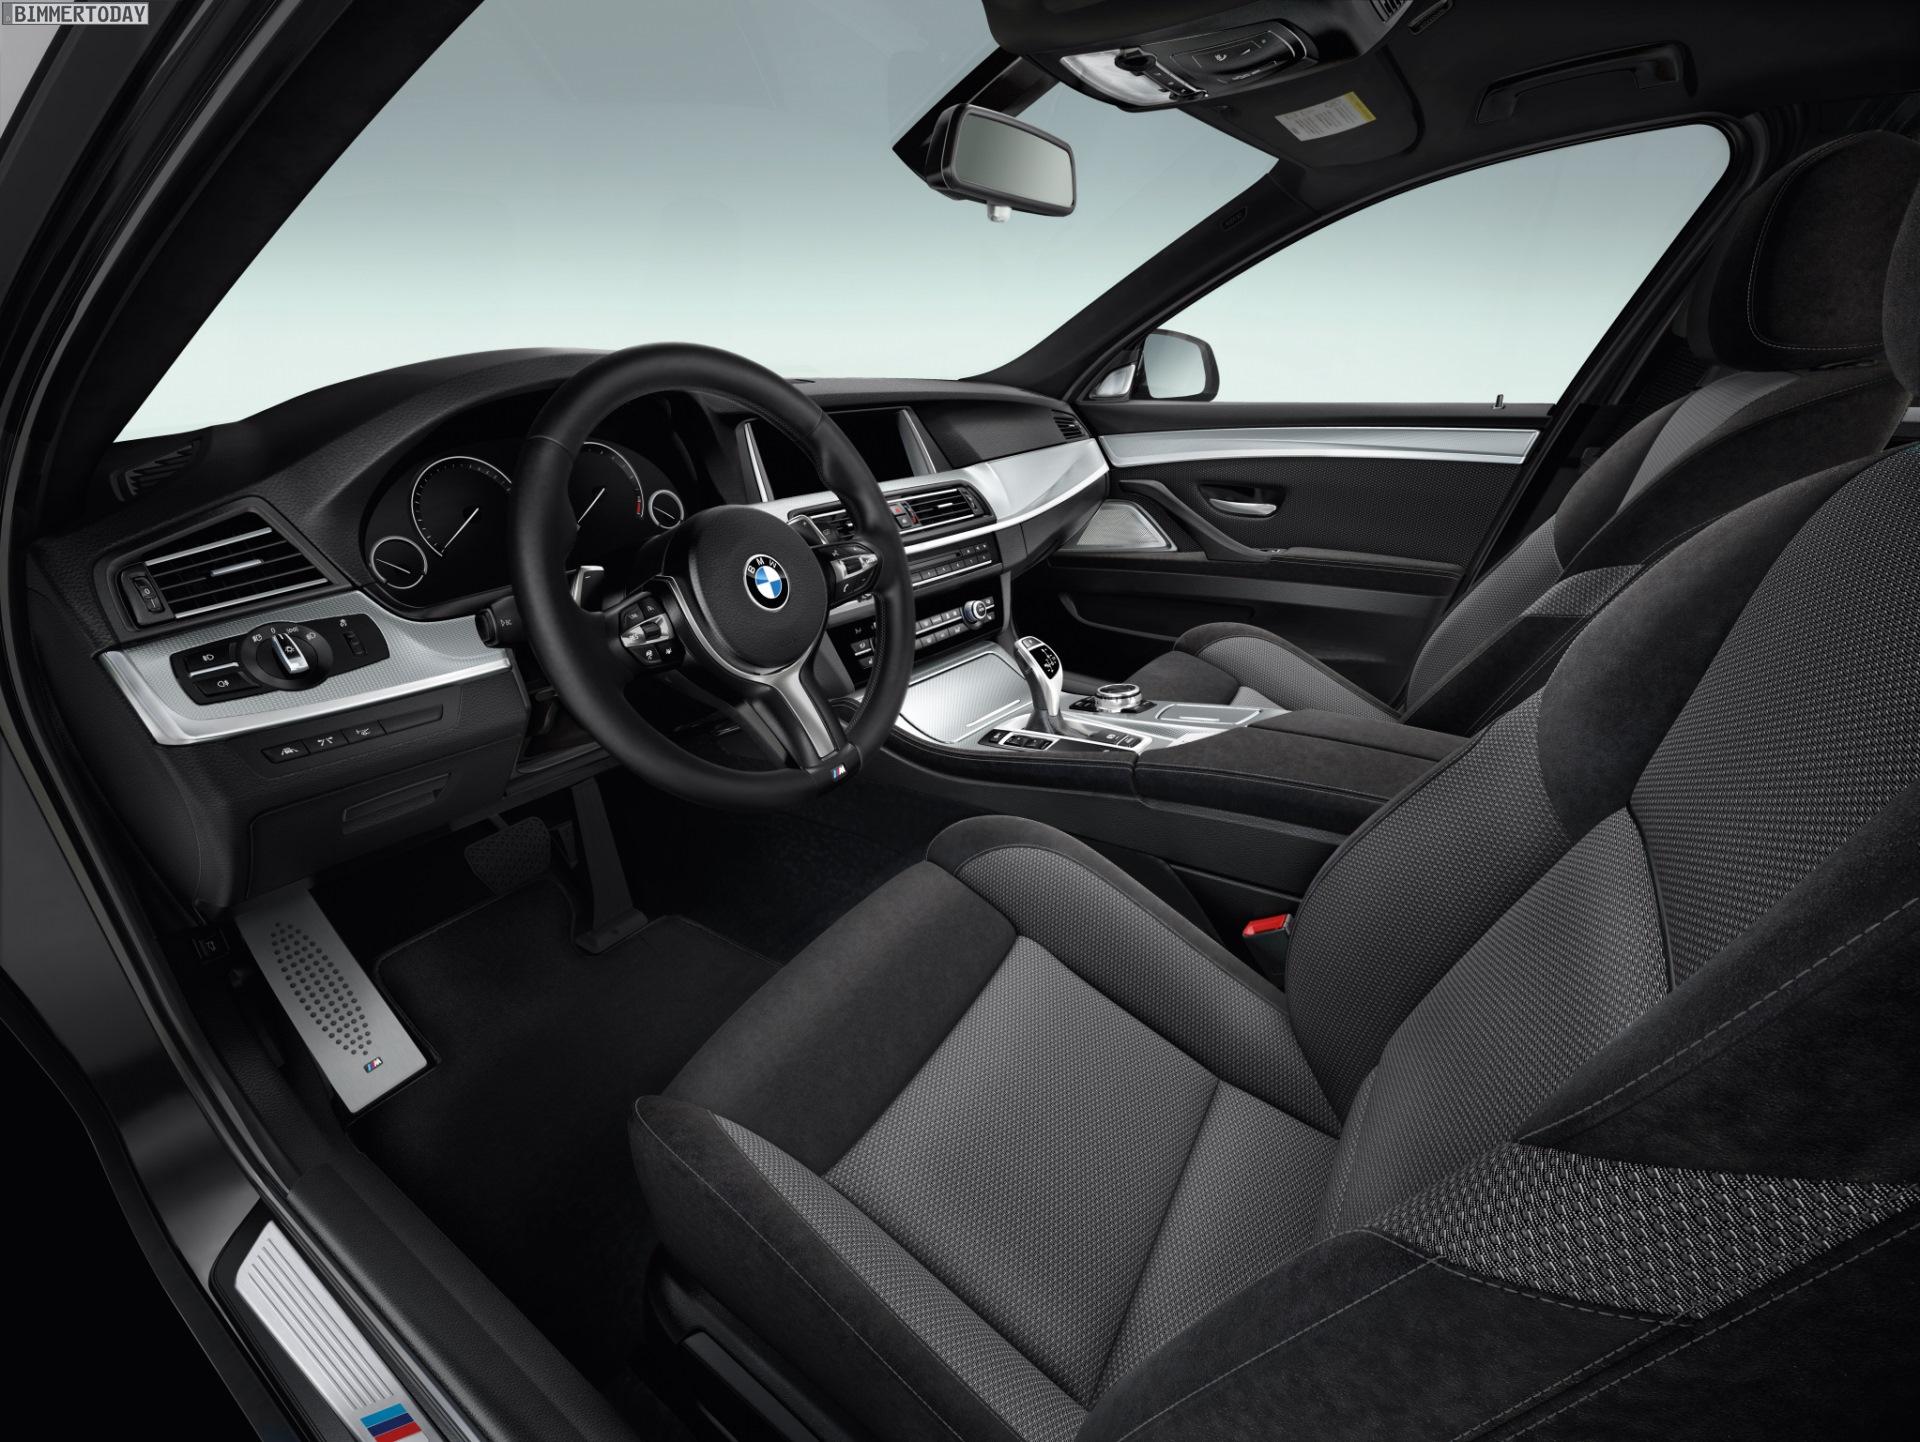 2014 BMW 5 Series M Sport Package Cabin